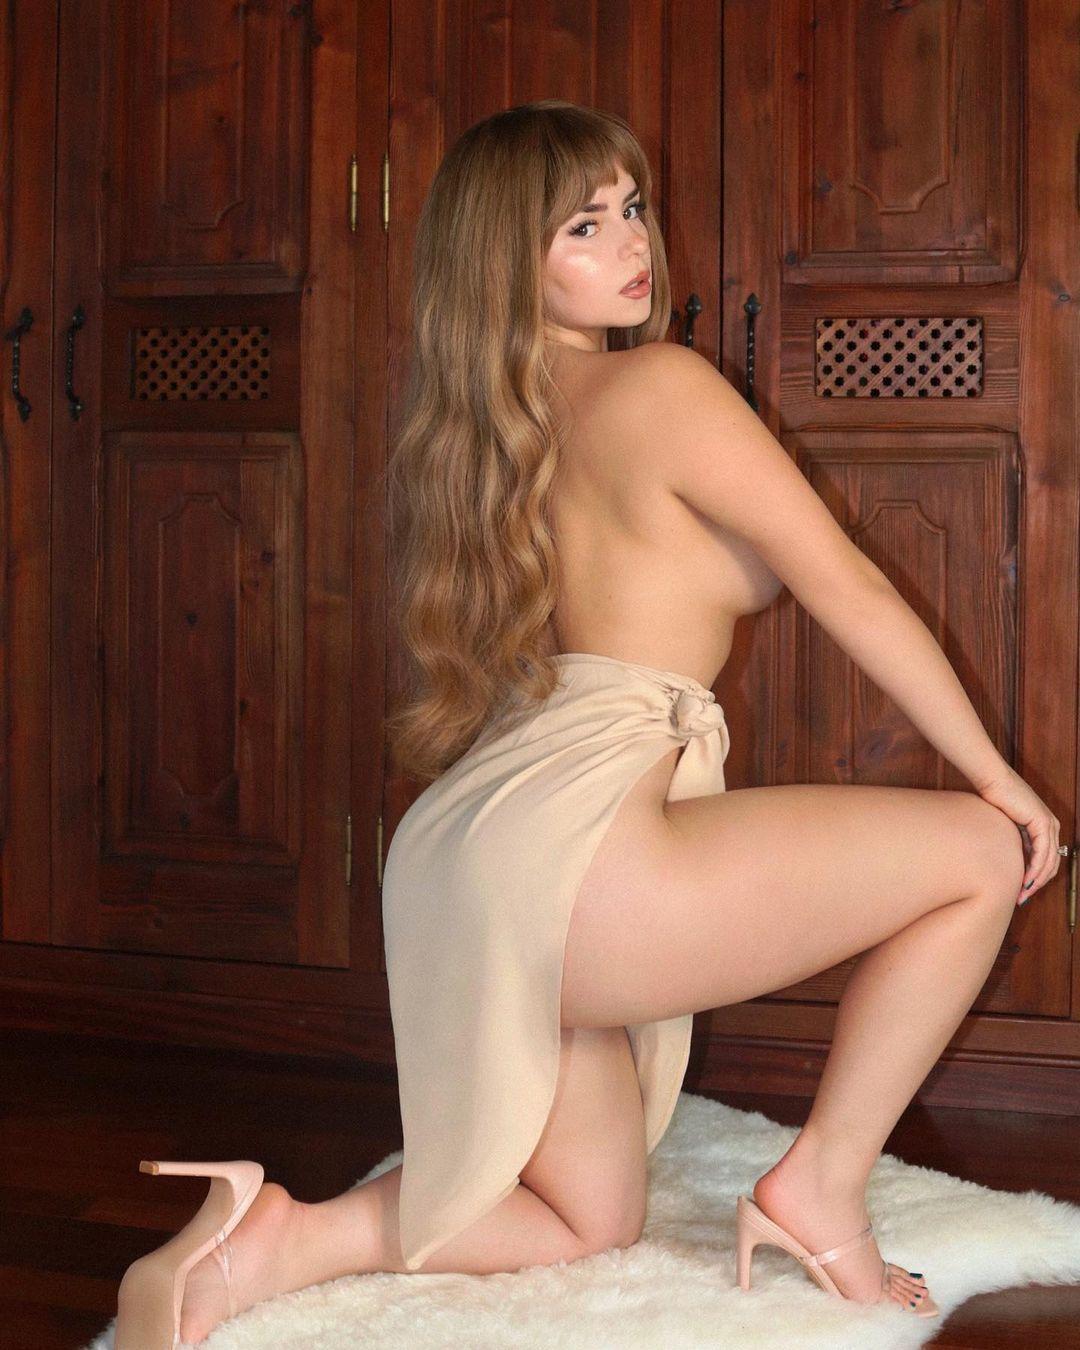 Demi Rose Mawby Topless Side Boob